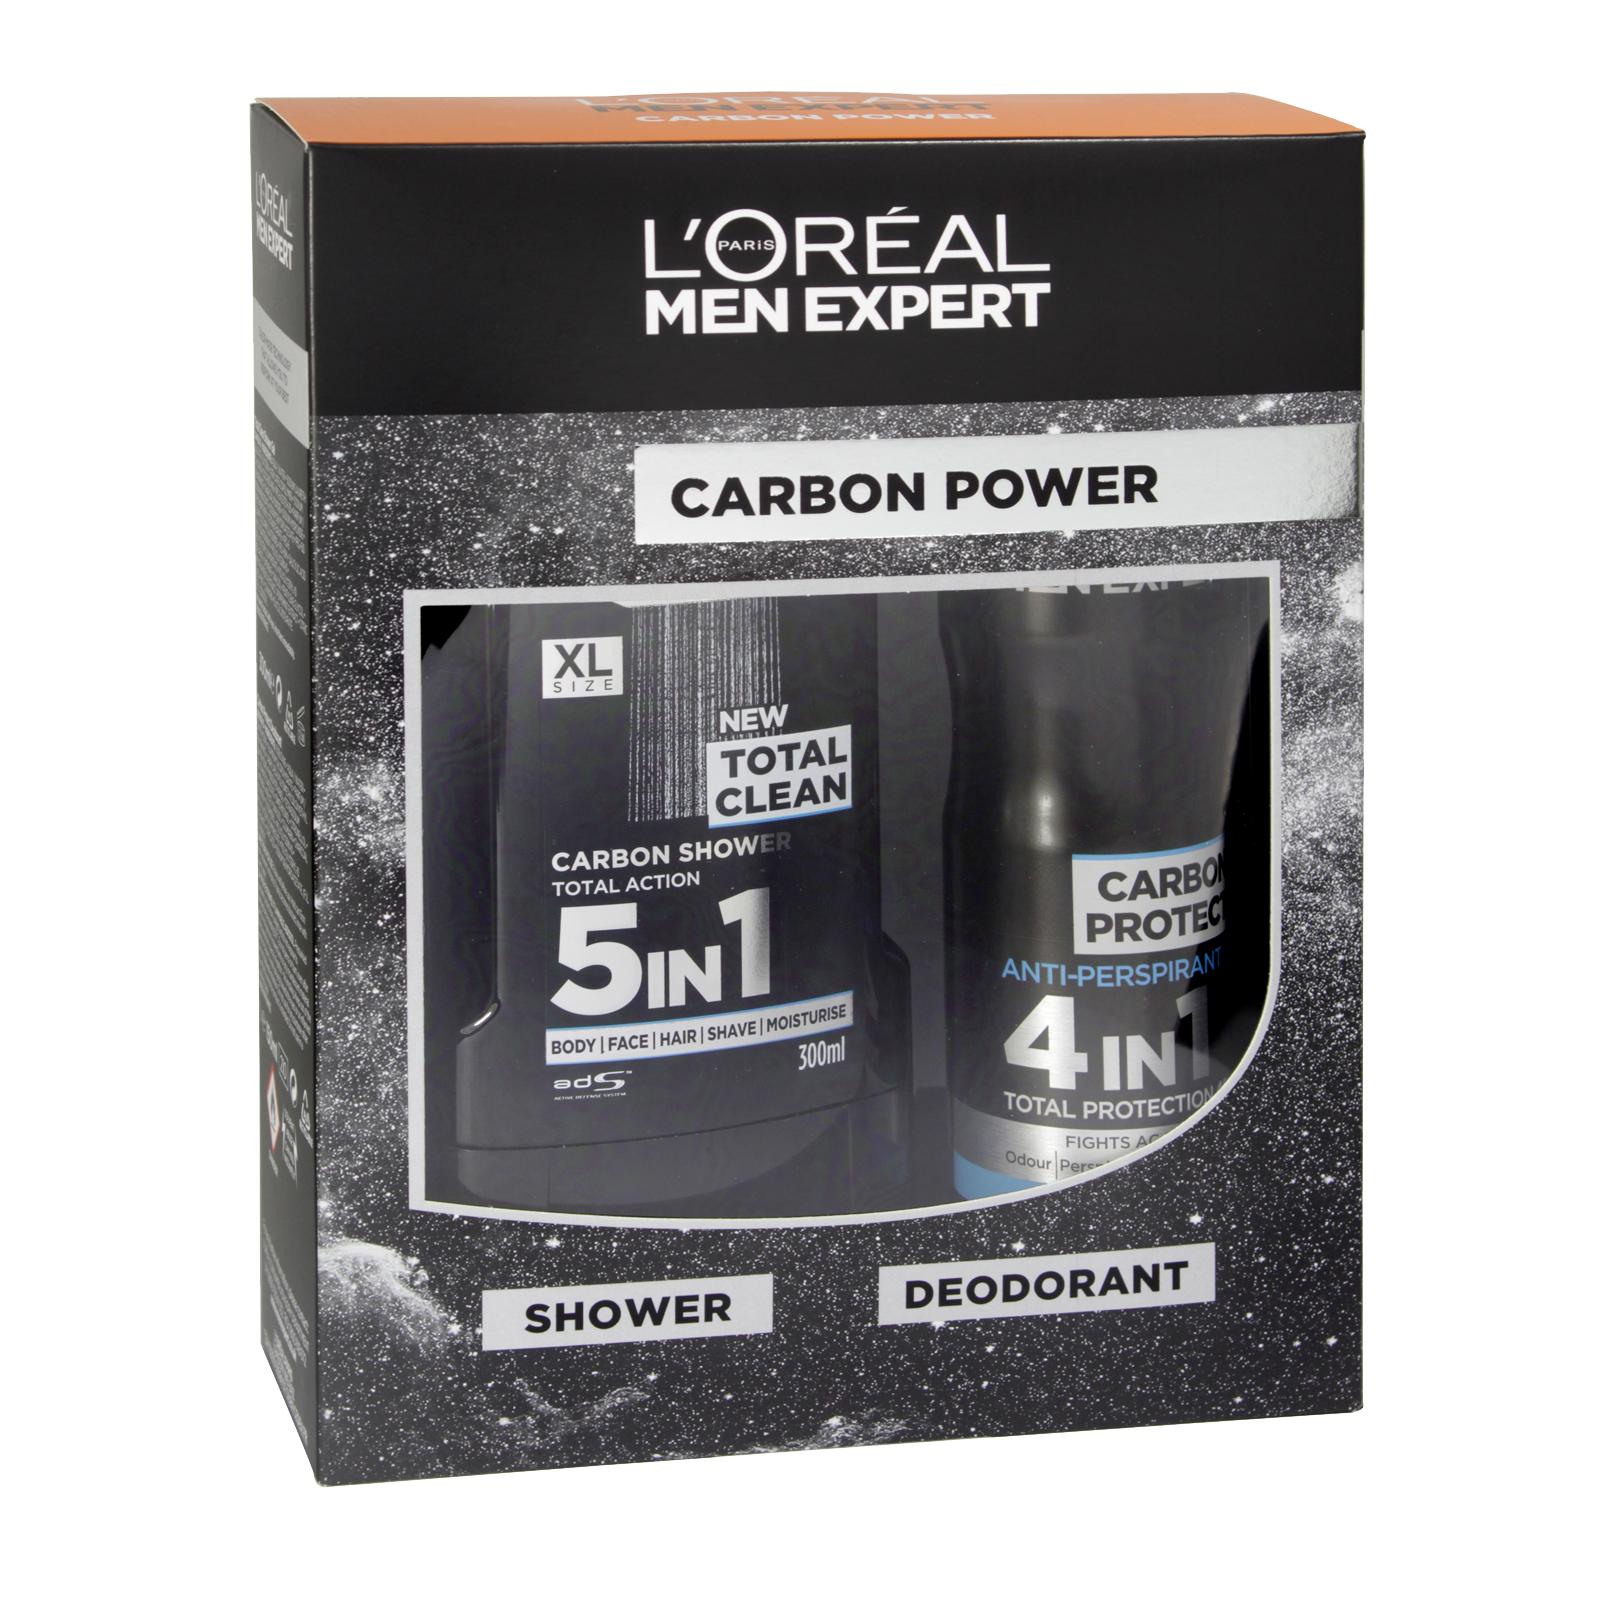 LOREAL MEN EXPERT 300ML SHOWER GEL+150ML DEOD CARBON POWER